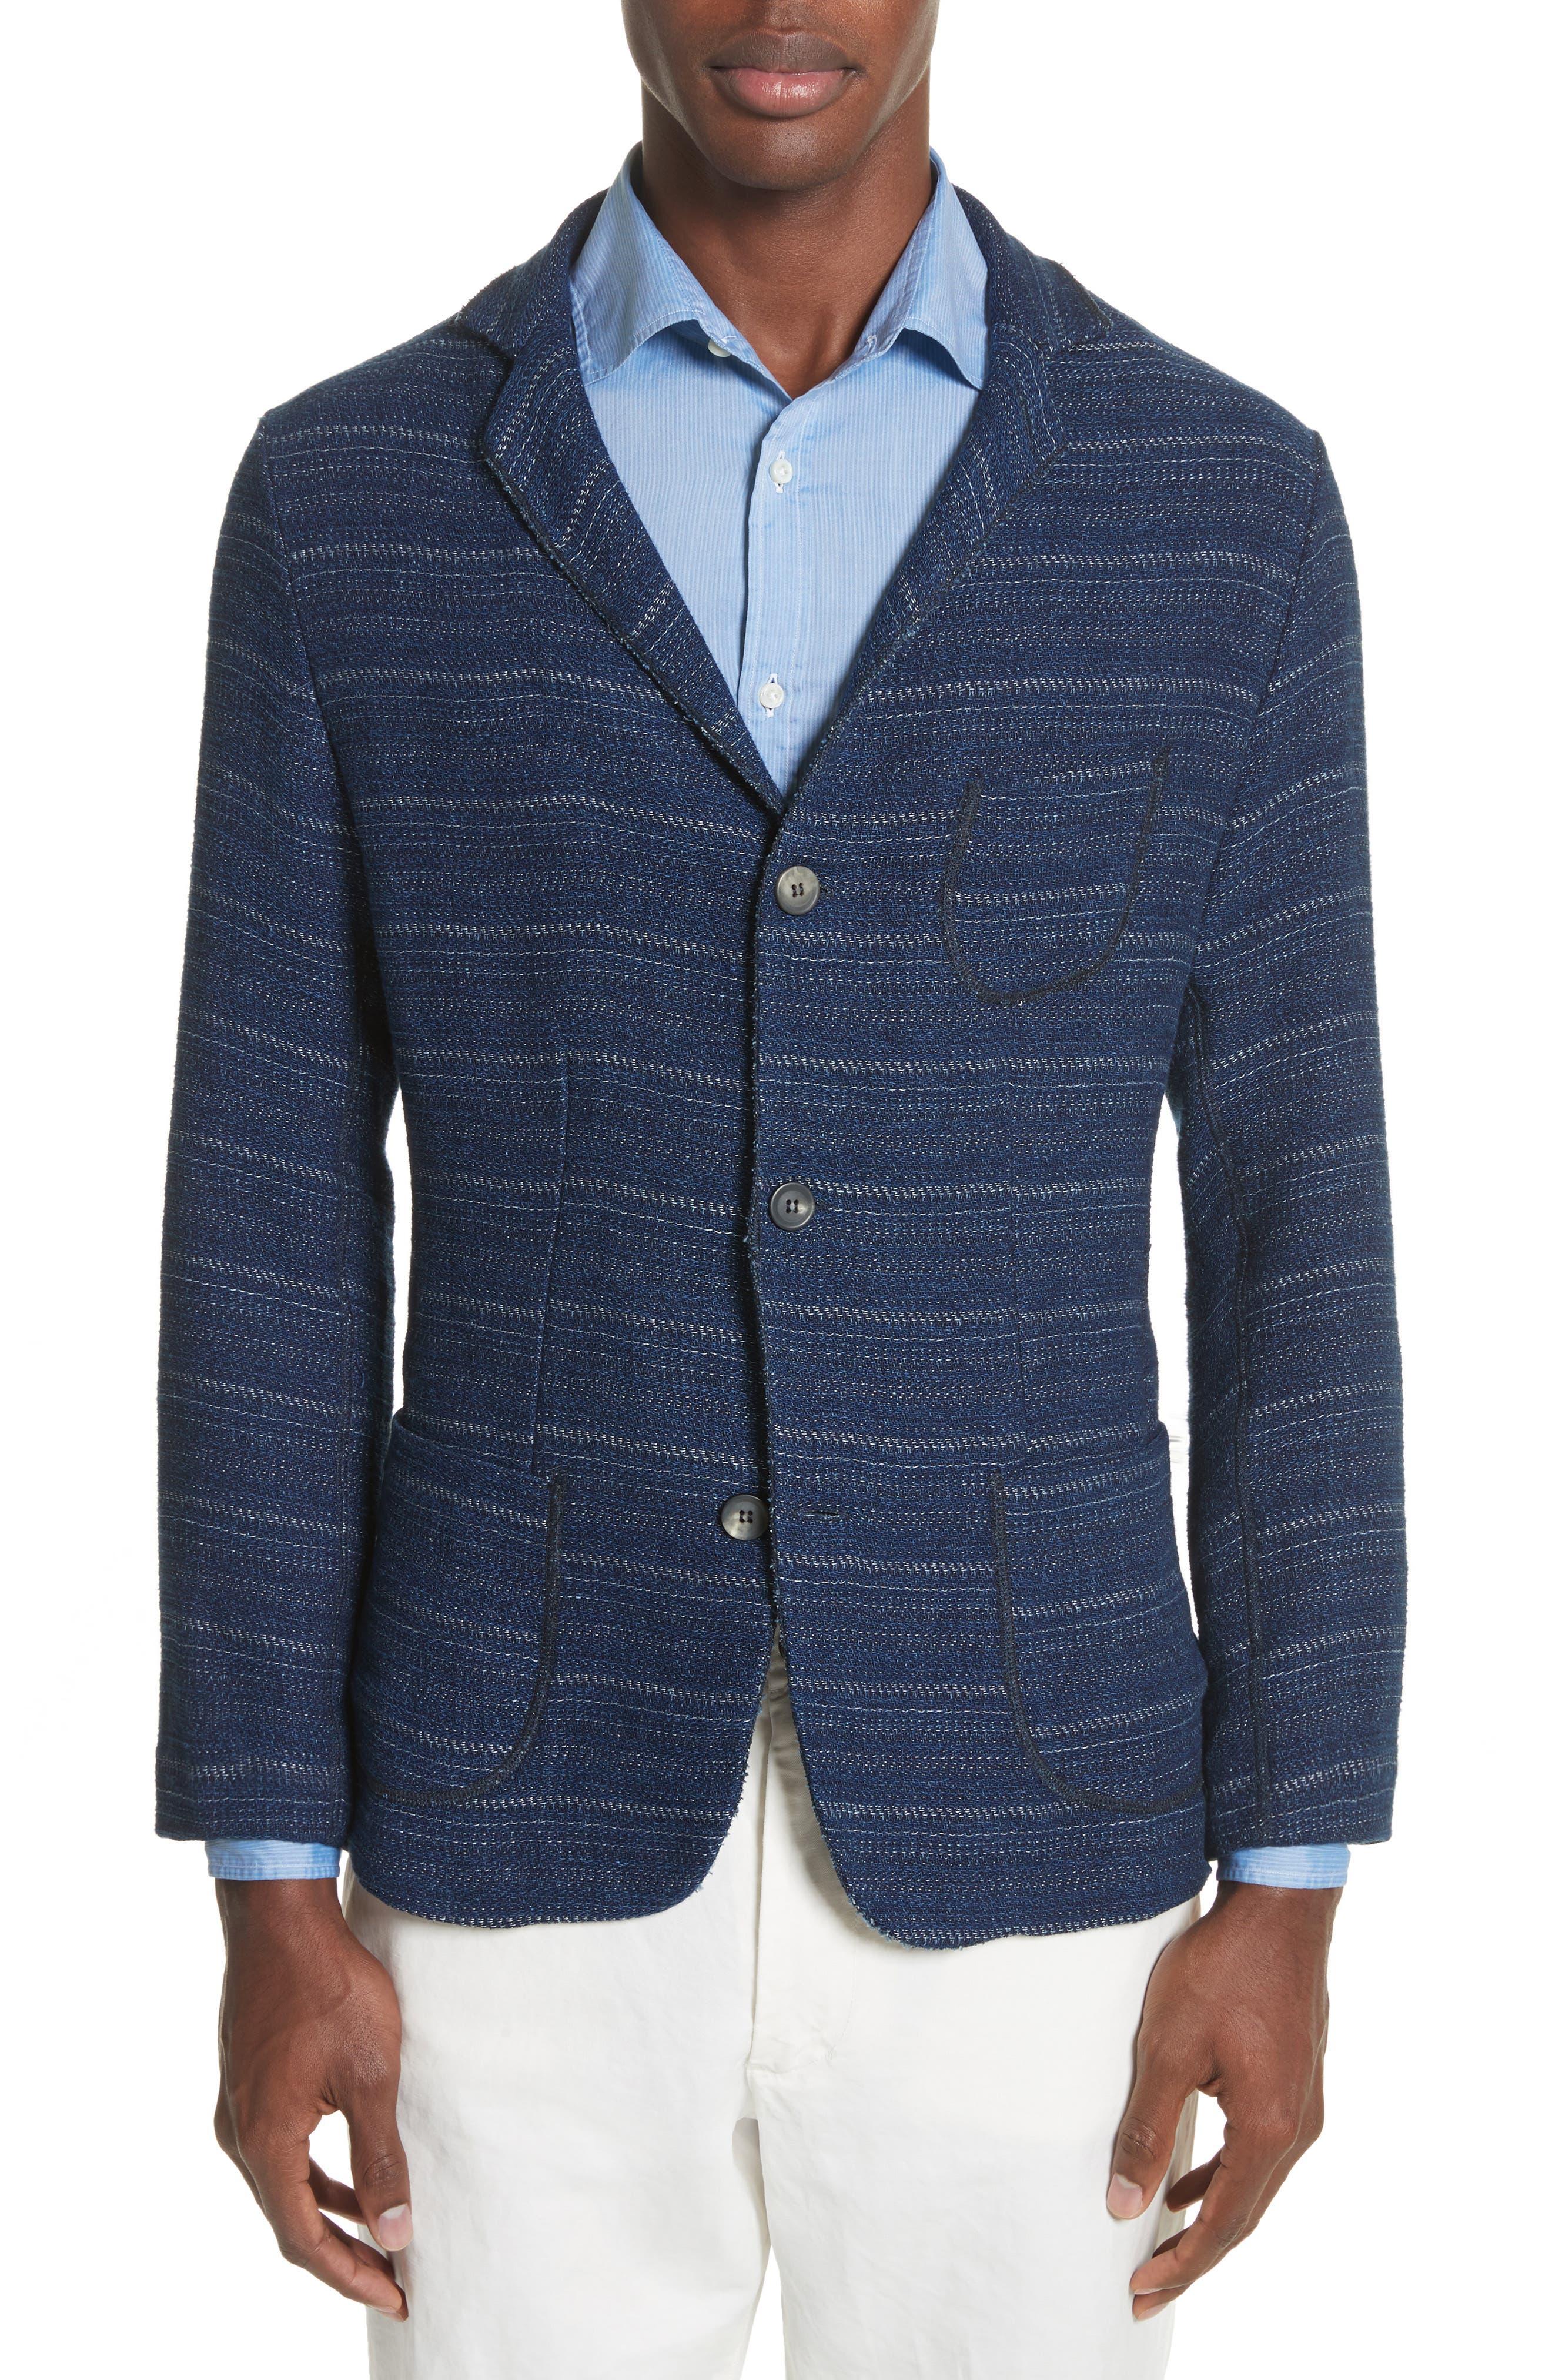 Napoli Nicola Barre Stripe Cotton & Linen Jacket,                             Main thumbnail 1, color,                             410